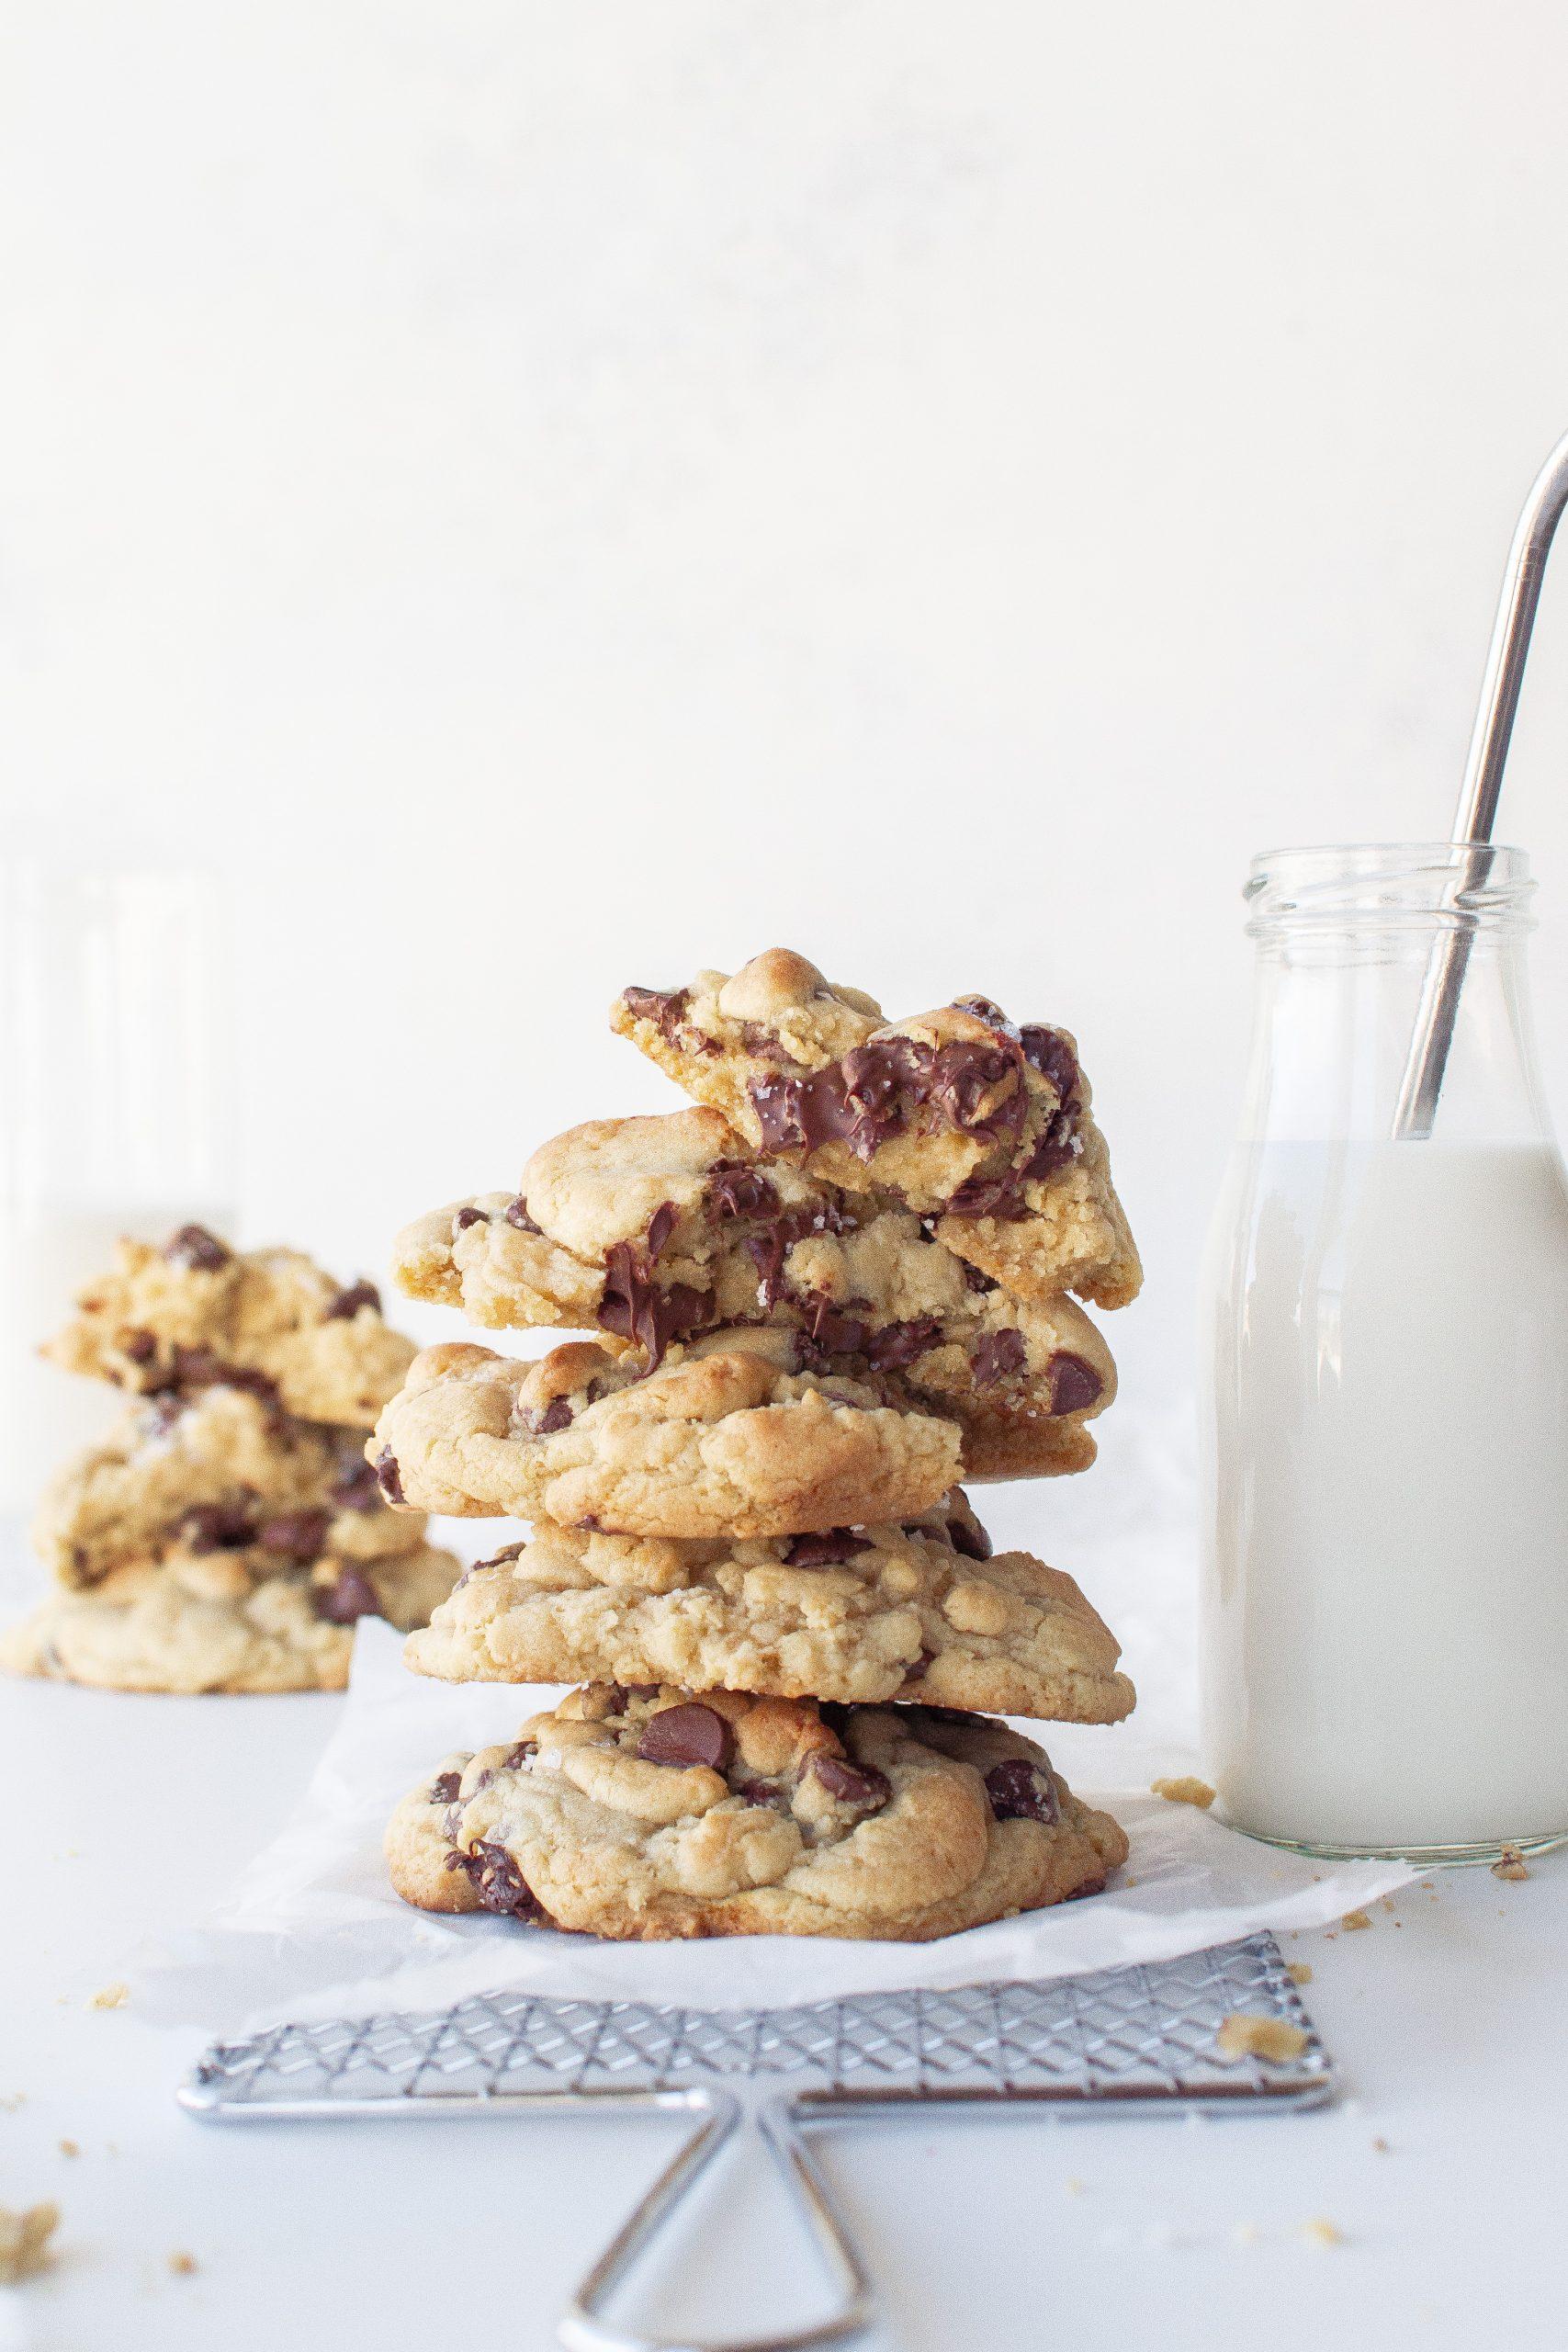 Crumbl Copycat Chocolate Chip Cookies Recipe